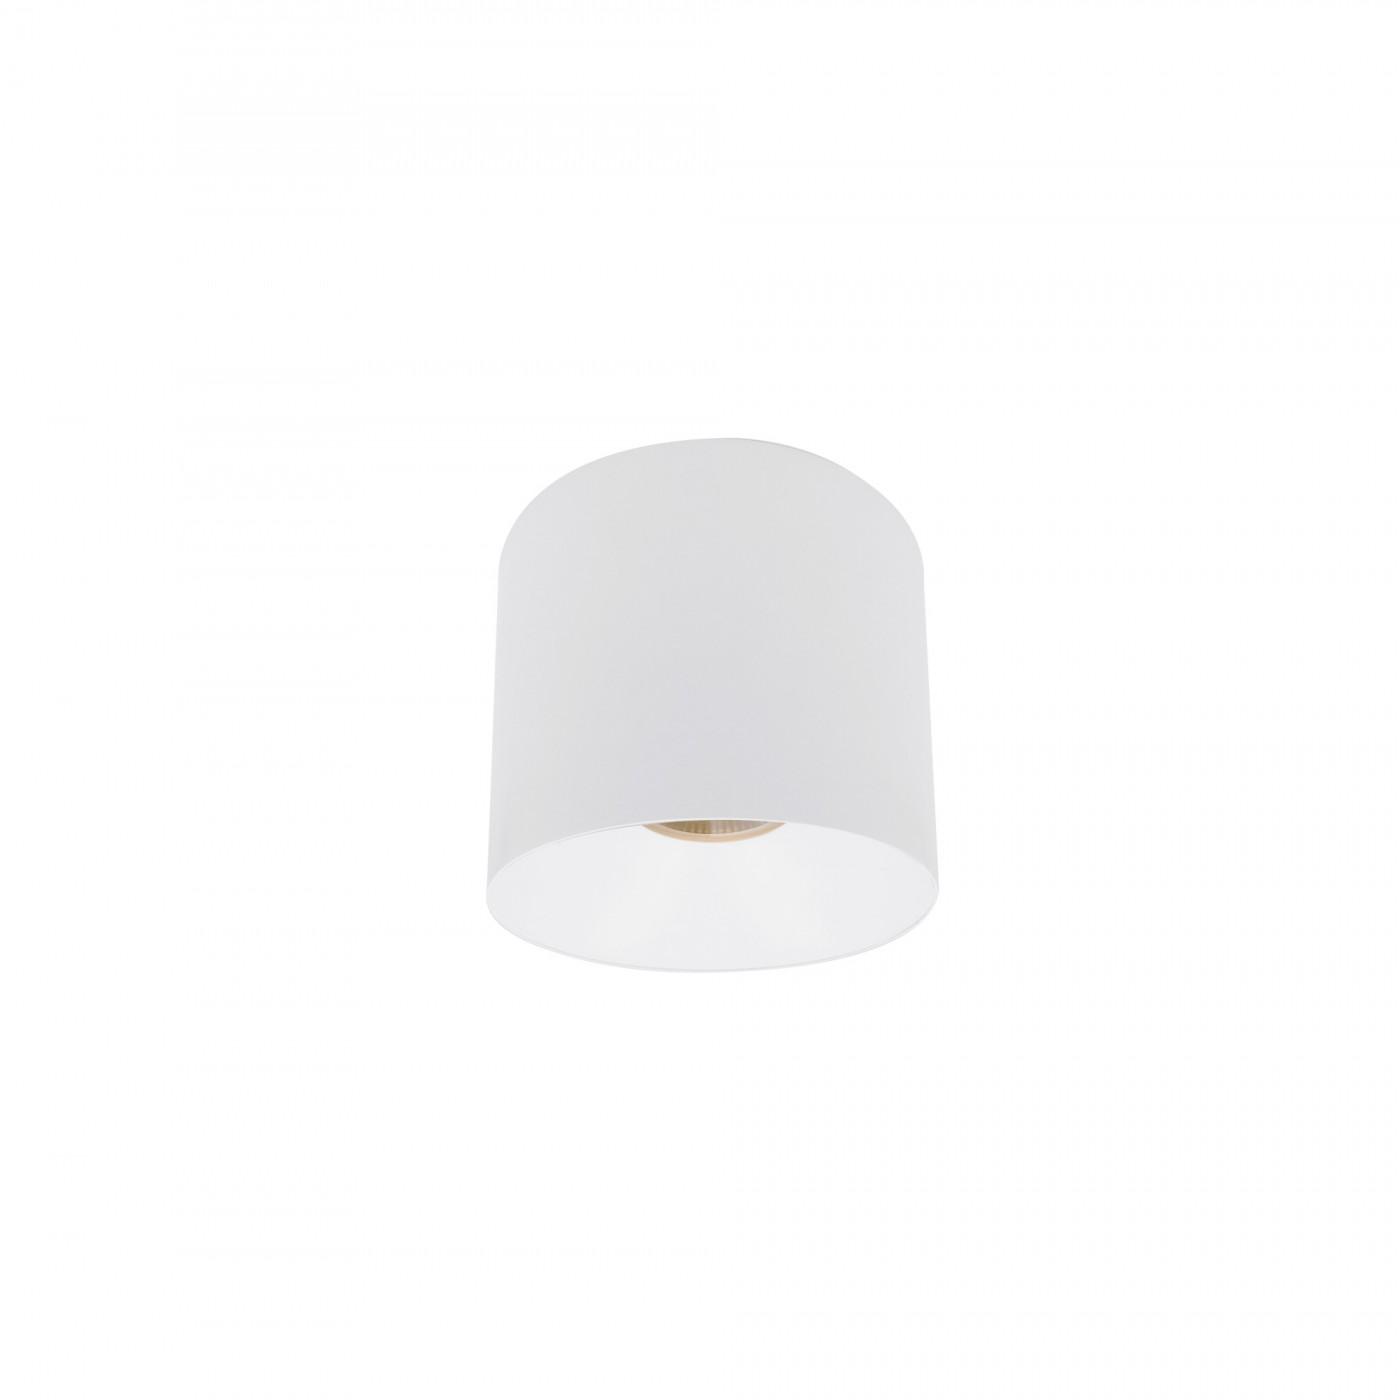 CL IOS LED 40W 3000K white 8726 Nowodvorski Lighting